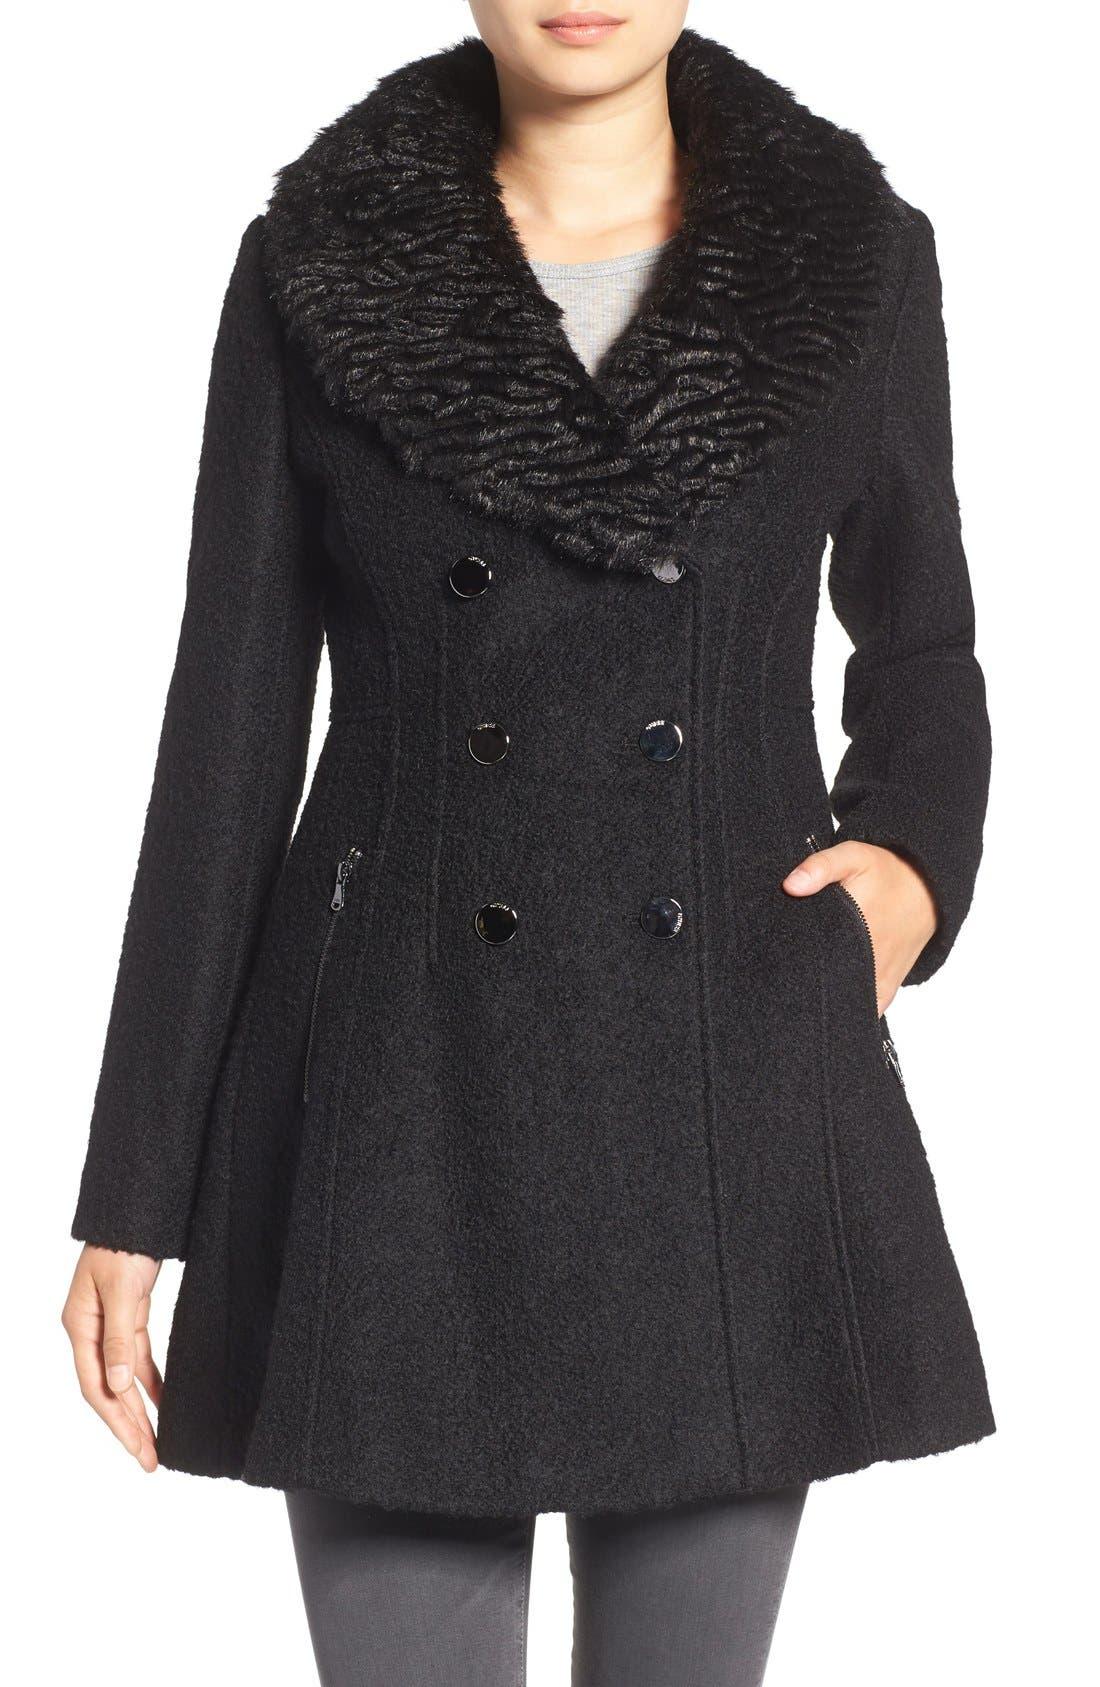 Main Image - GUESS Bouclé Fit & Flare Coat with Faux Fur Collar